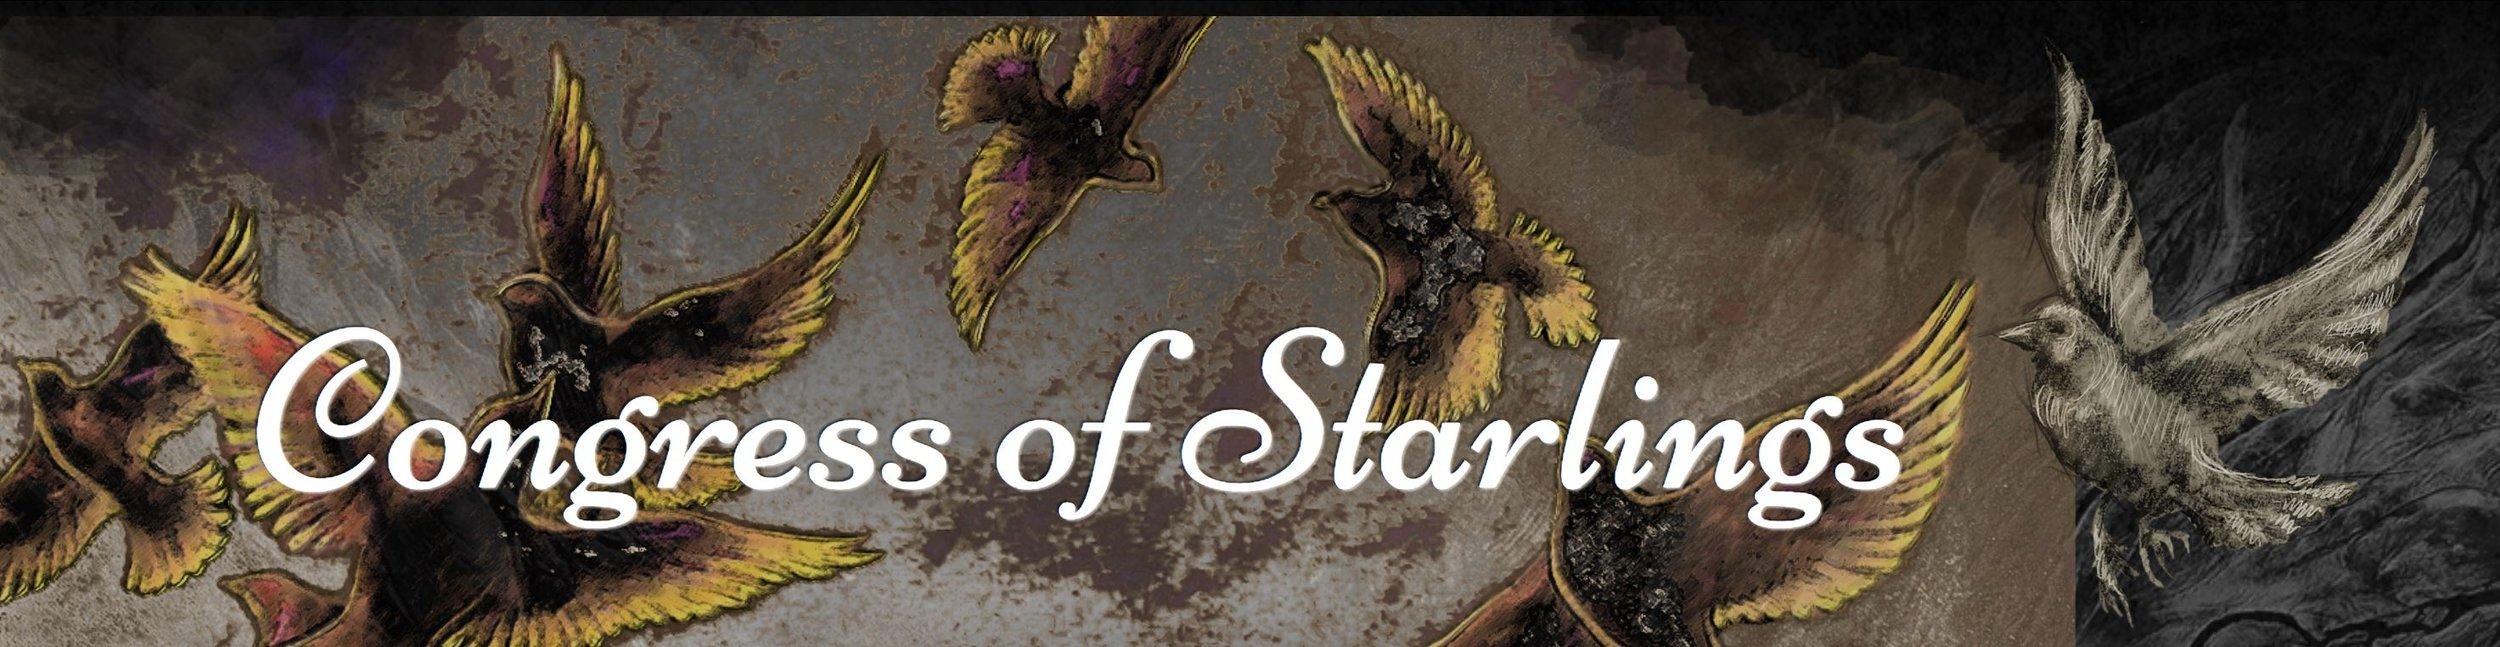 Congress of Starlings2.JPG